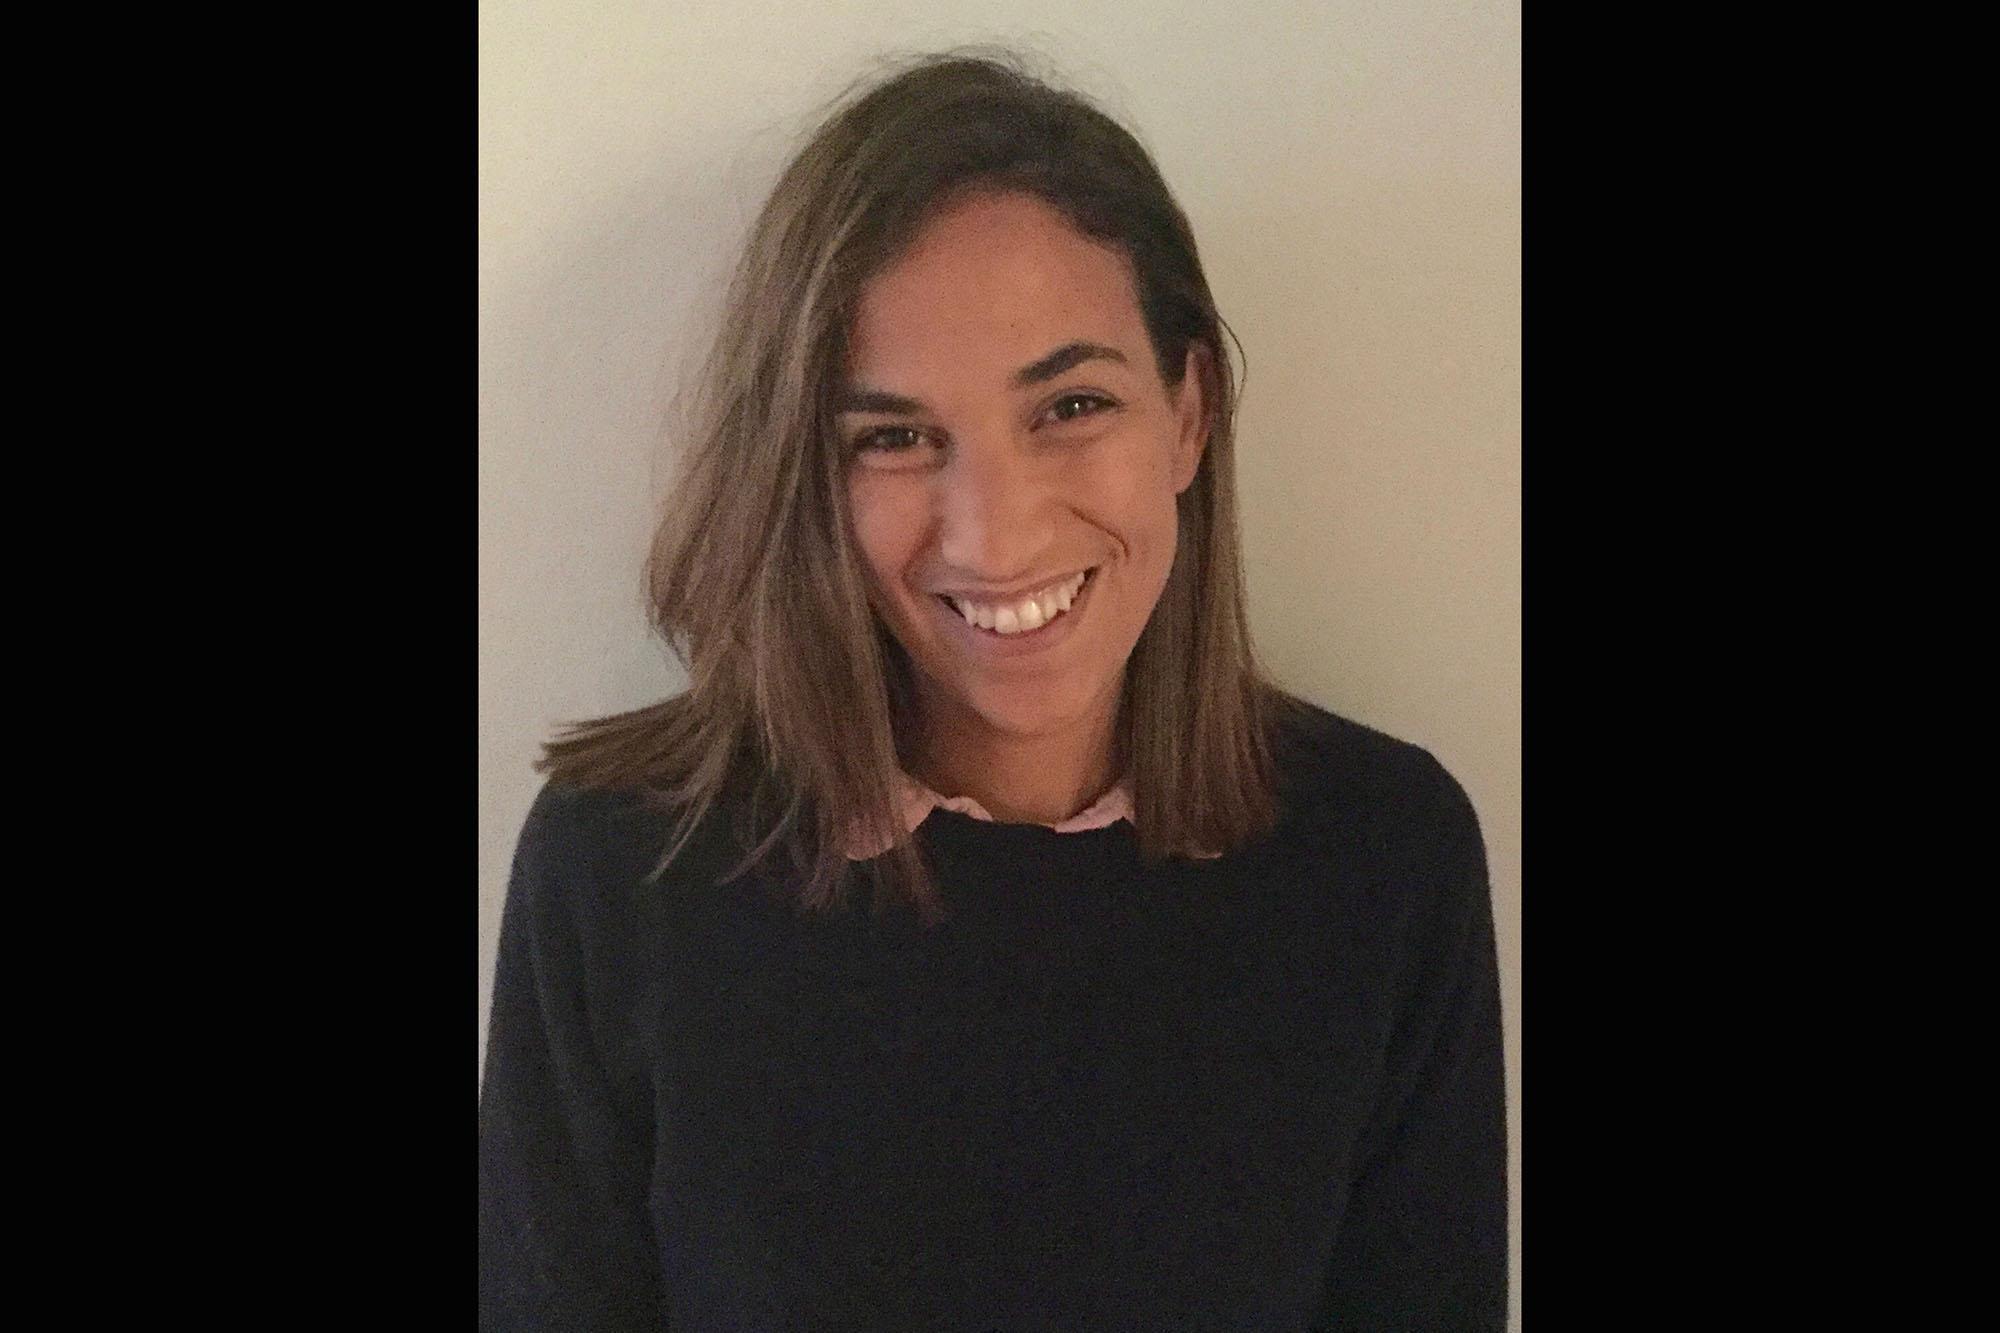 BBC Films hires Claudia Yusef as head of development | News